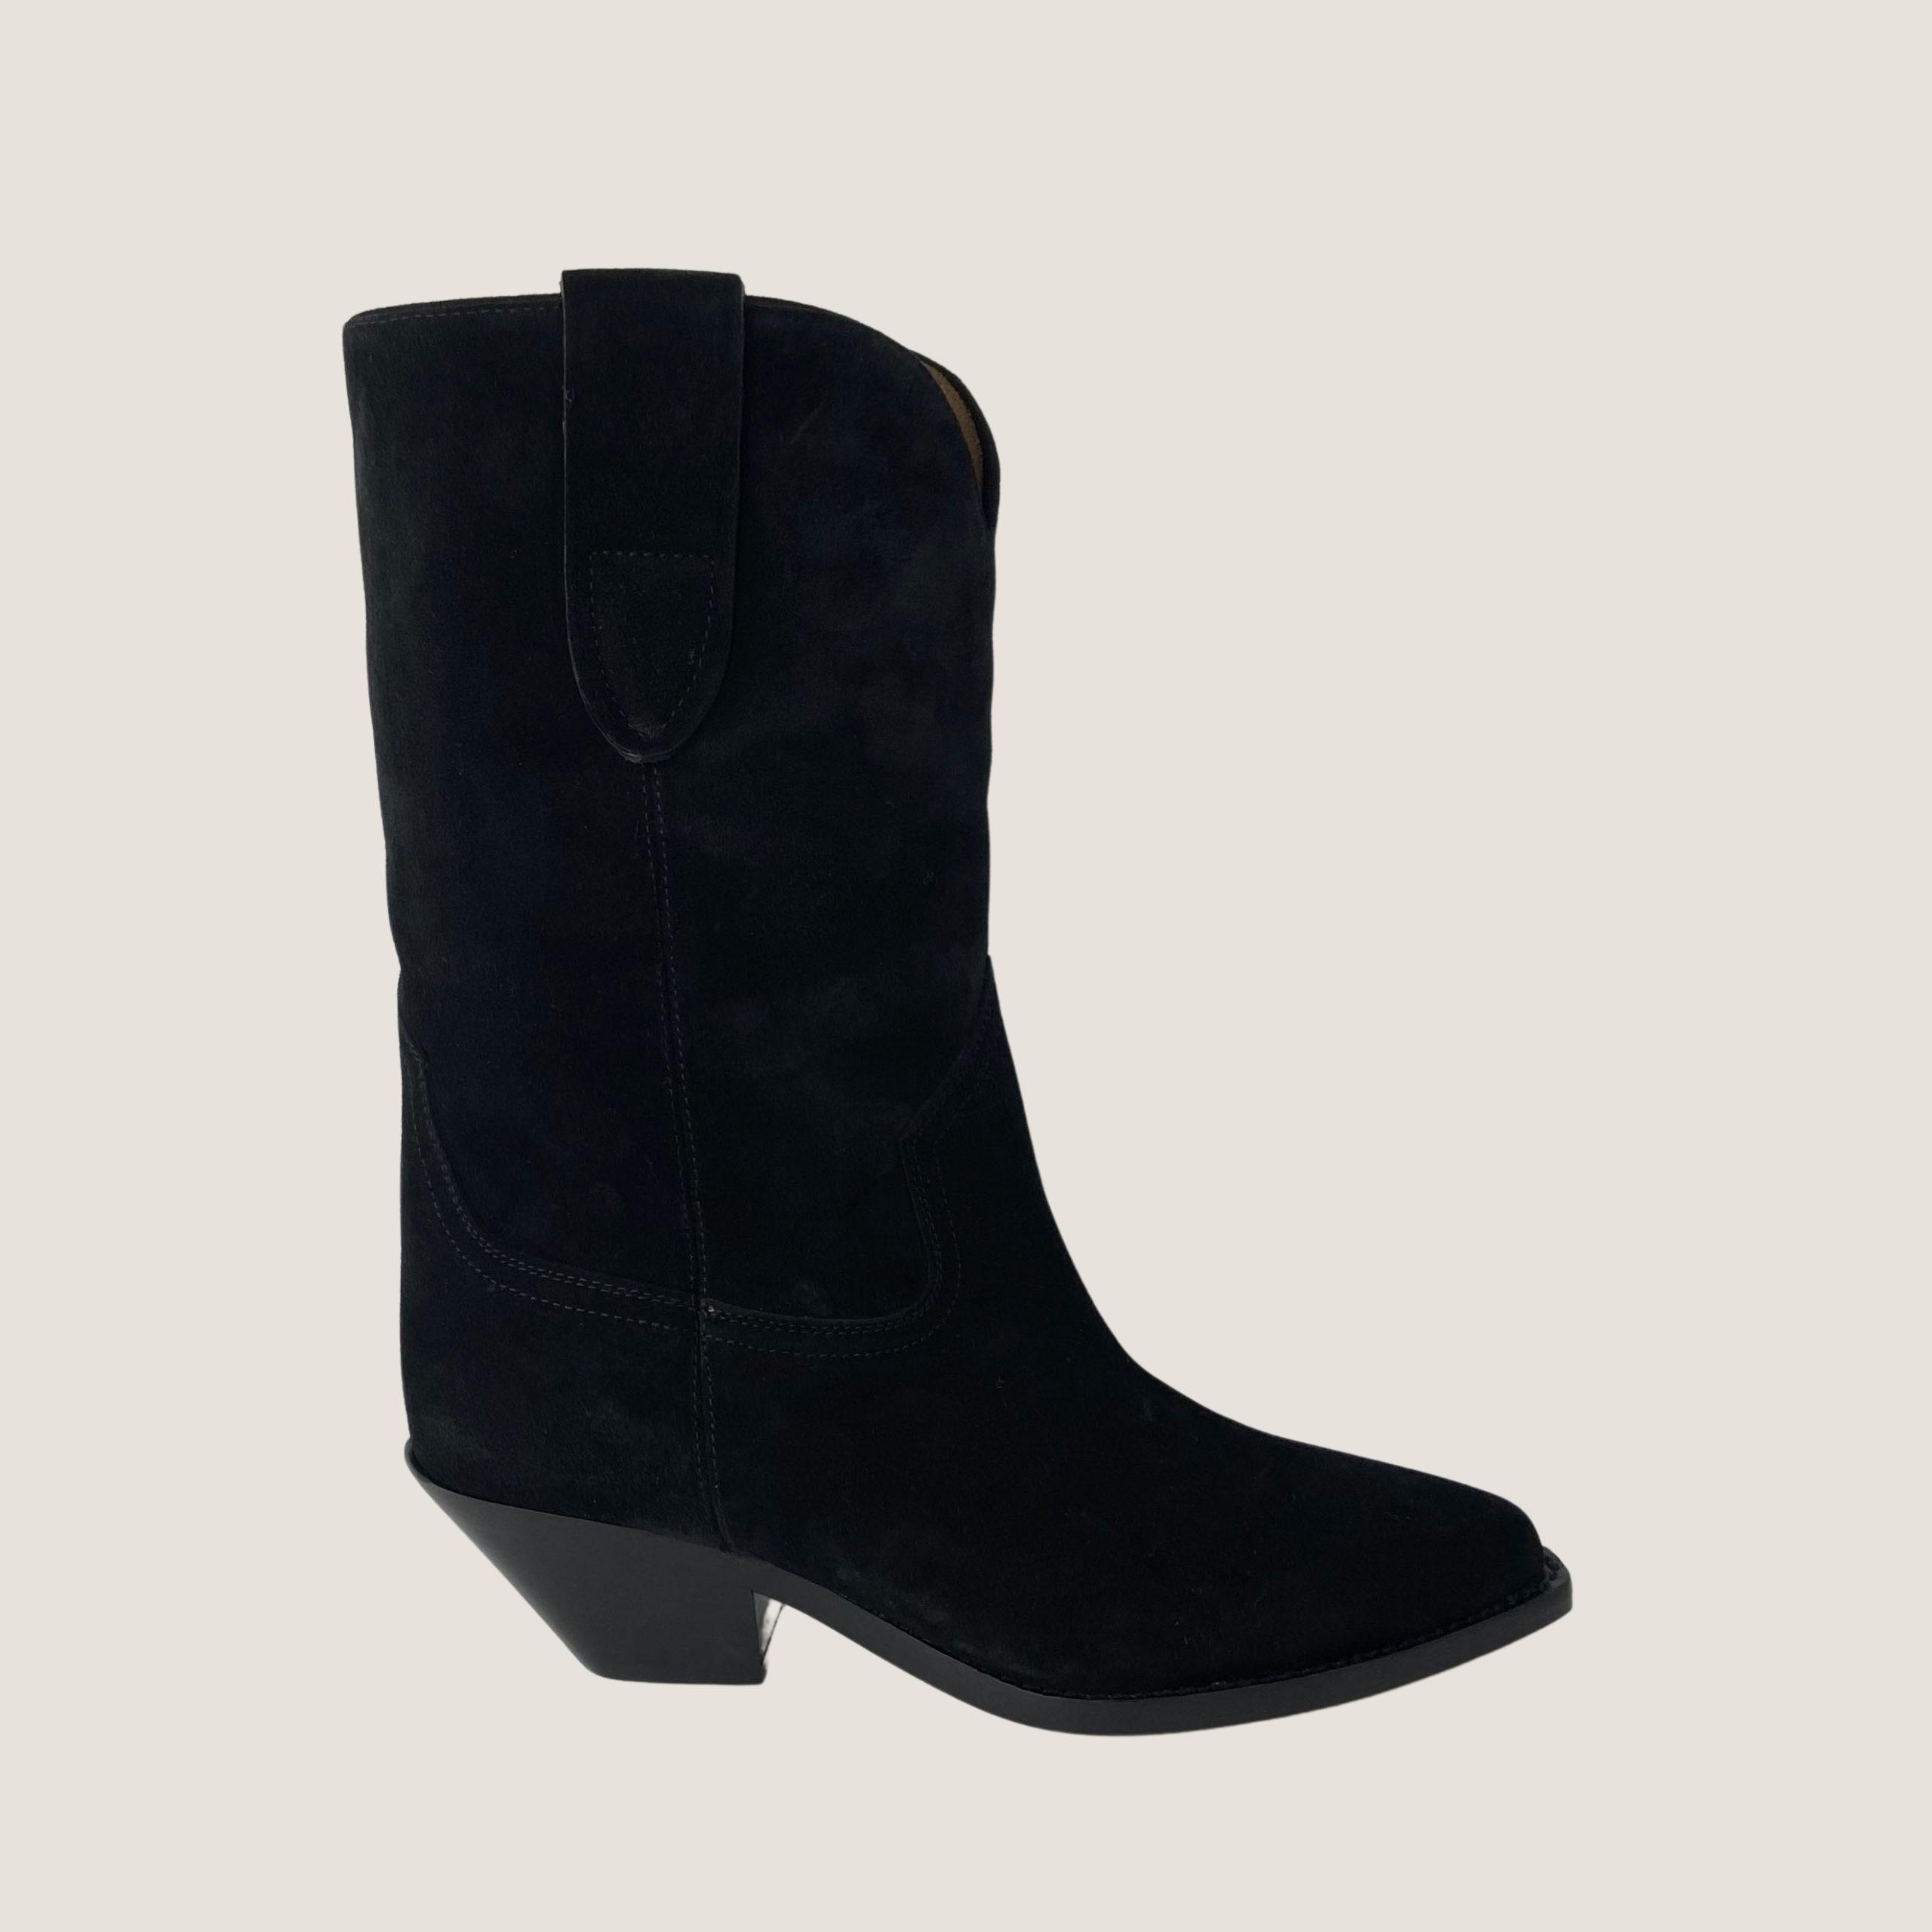 Dahope Boots - Suede